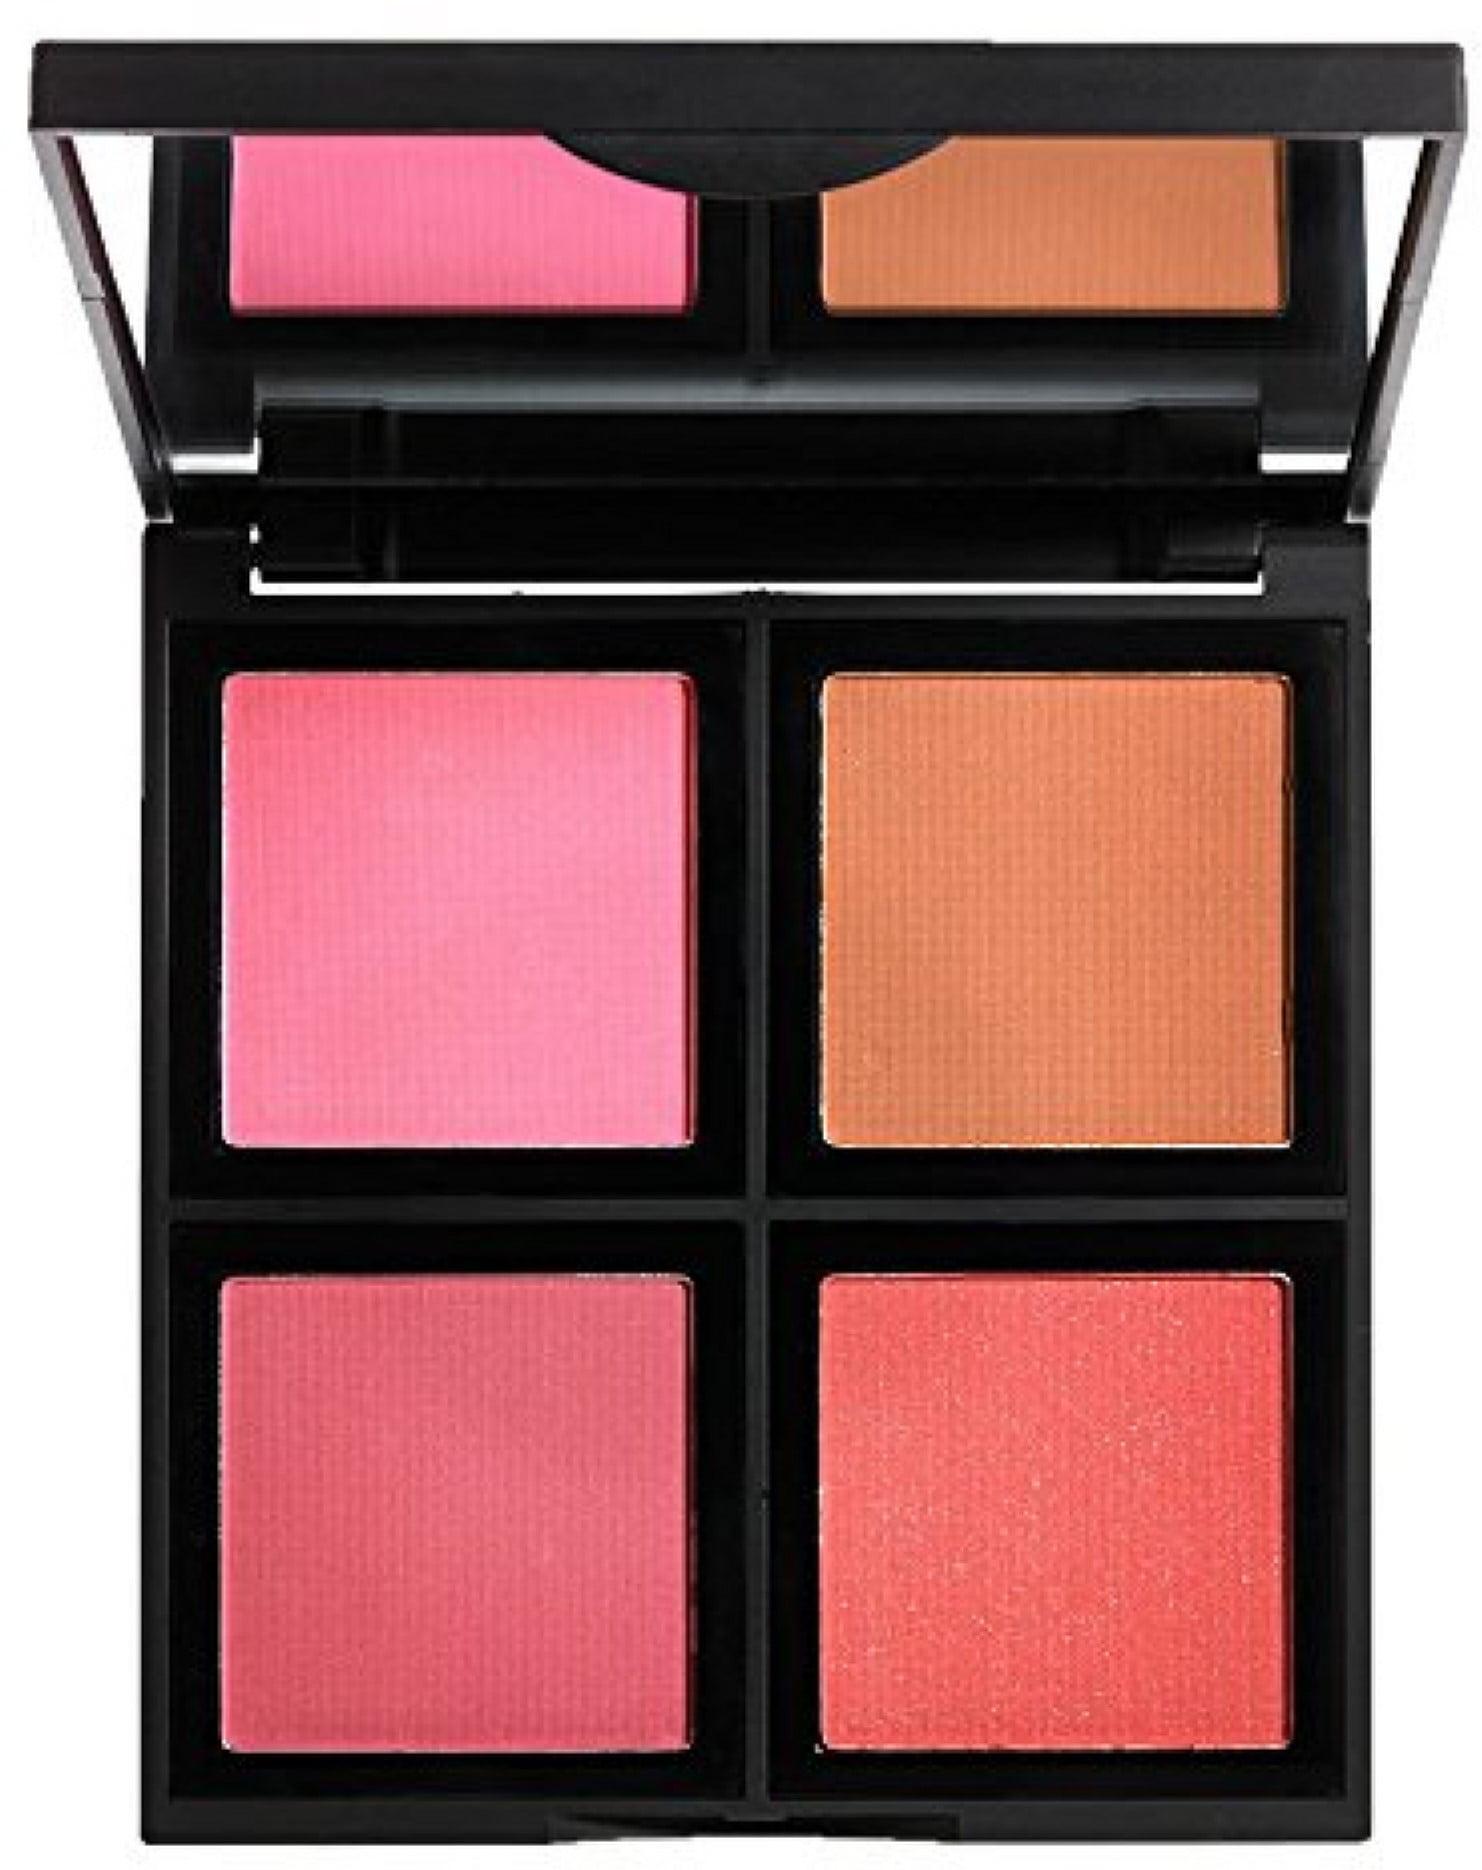 3 Pack - E.l.f. Blush Palette Light 0.56 oz